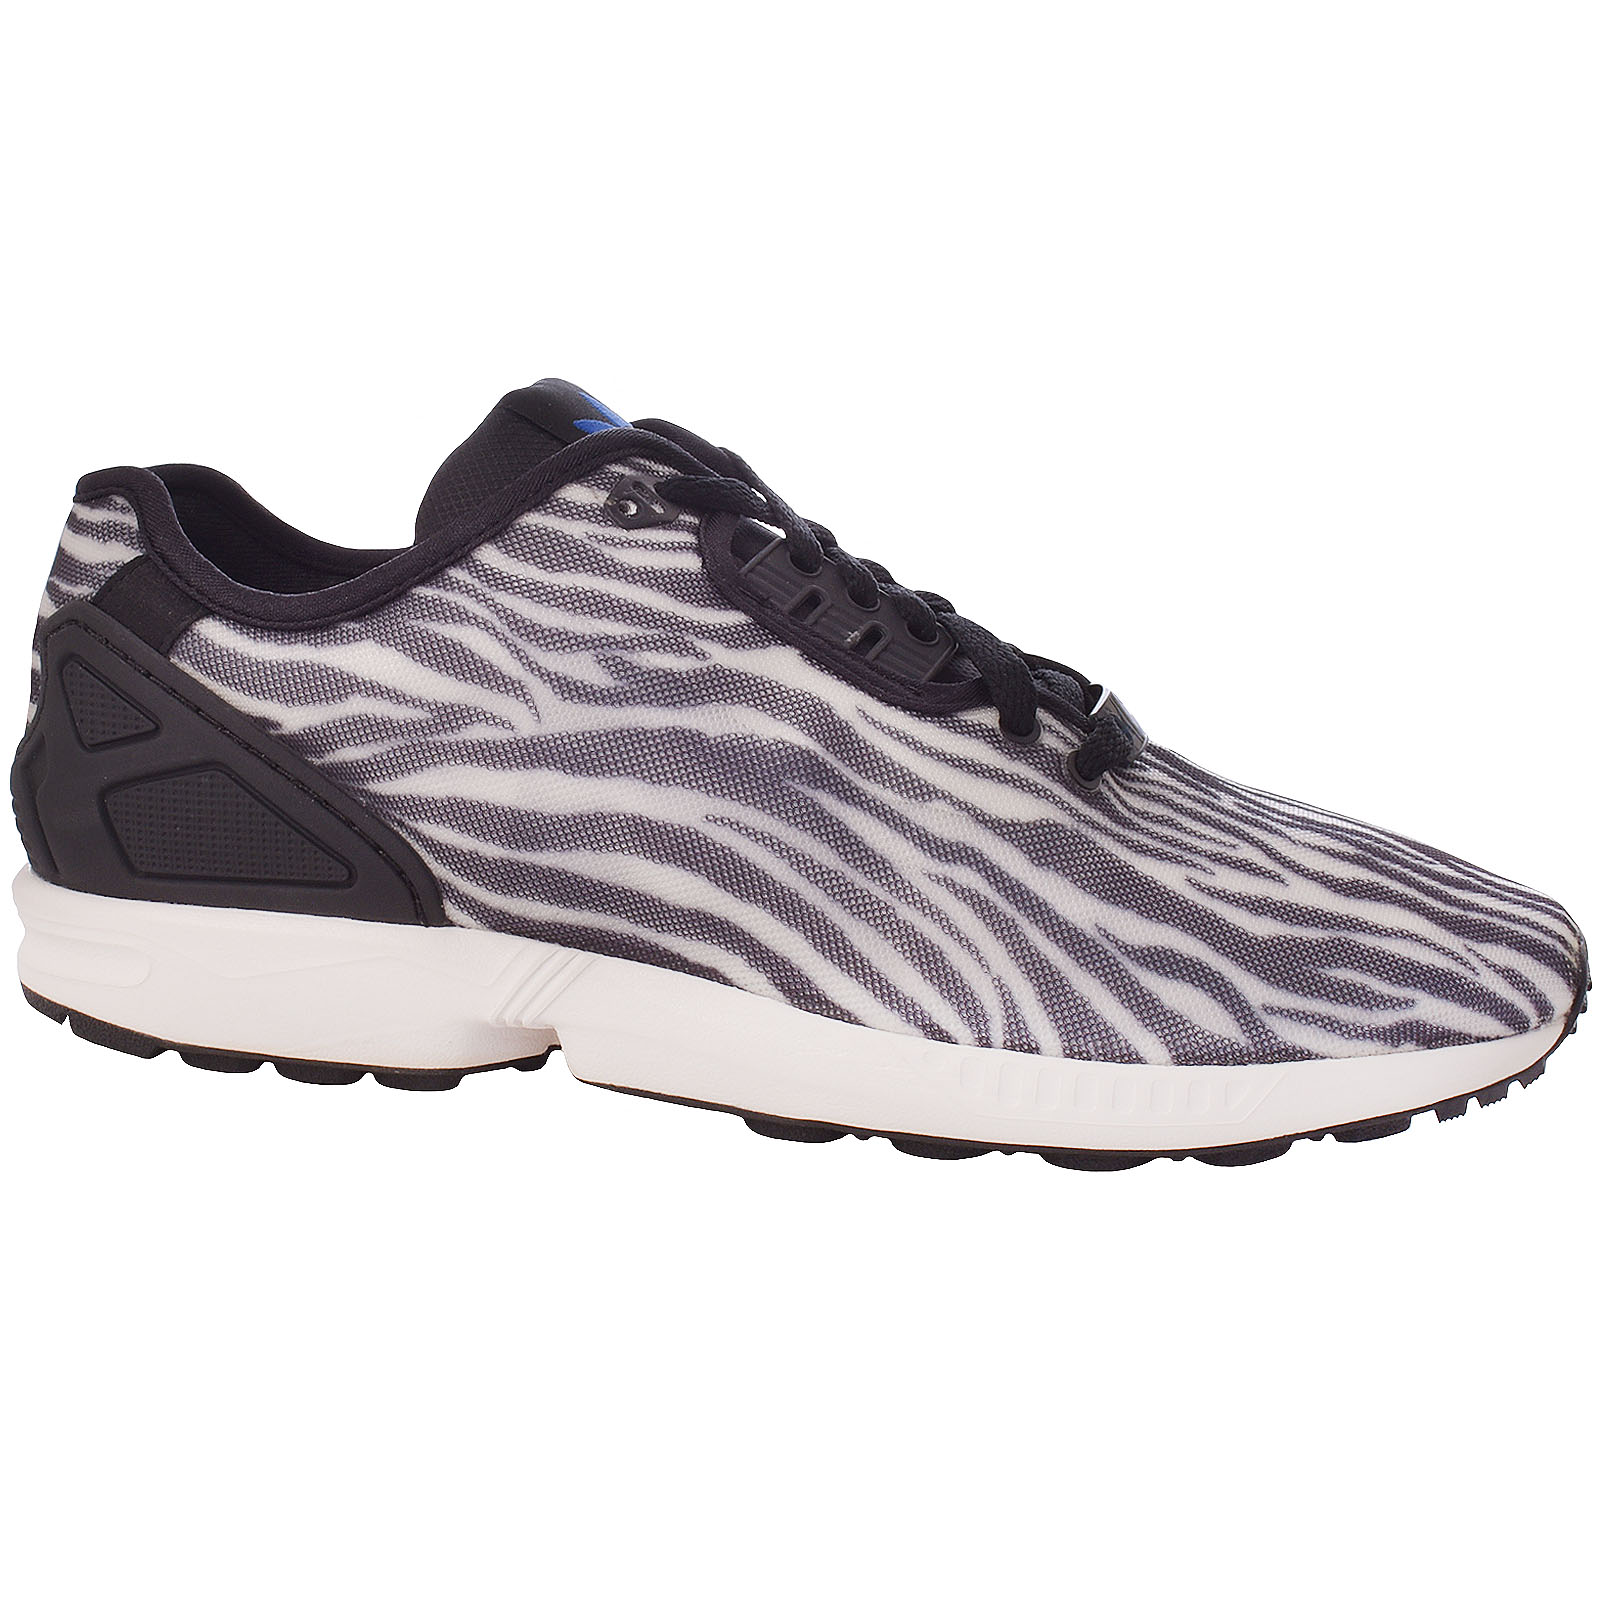 Adidas Adidas Adidas Originals  Uomo ZX Flux Decon Sports Schuhes Trainers - Zebra / Snakeskin 1cab82